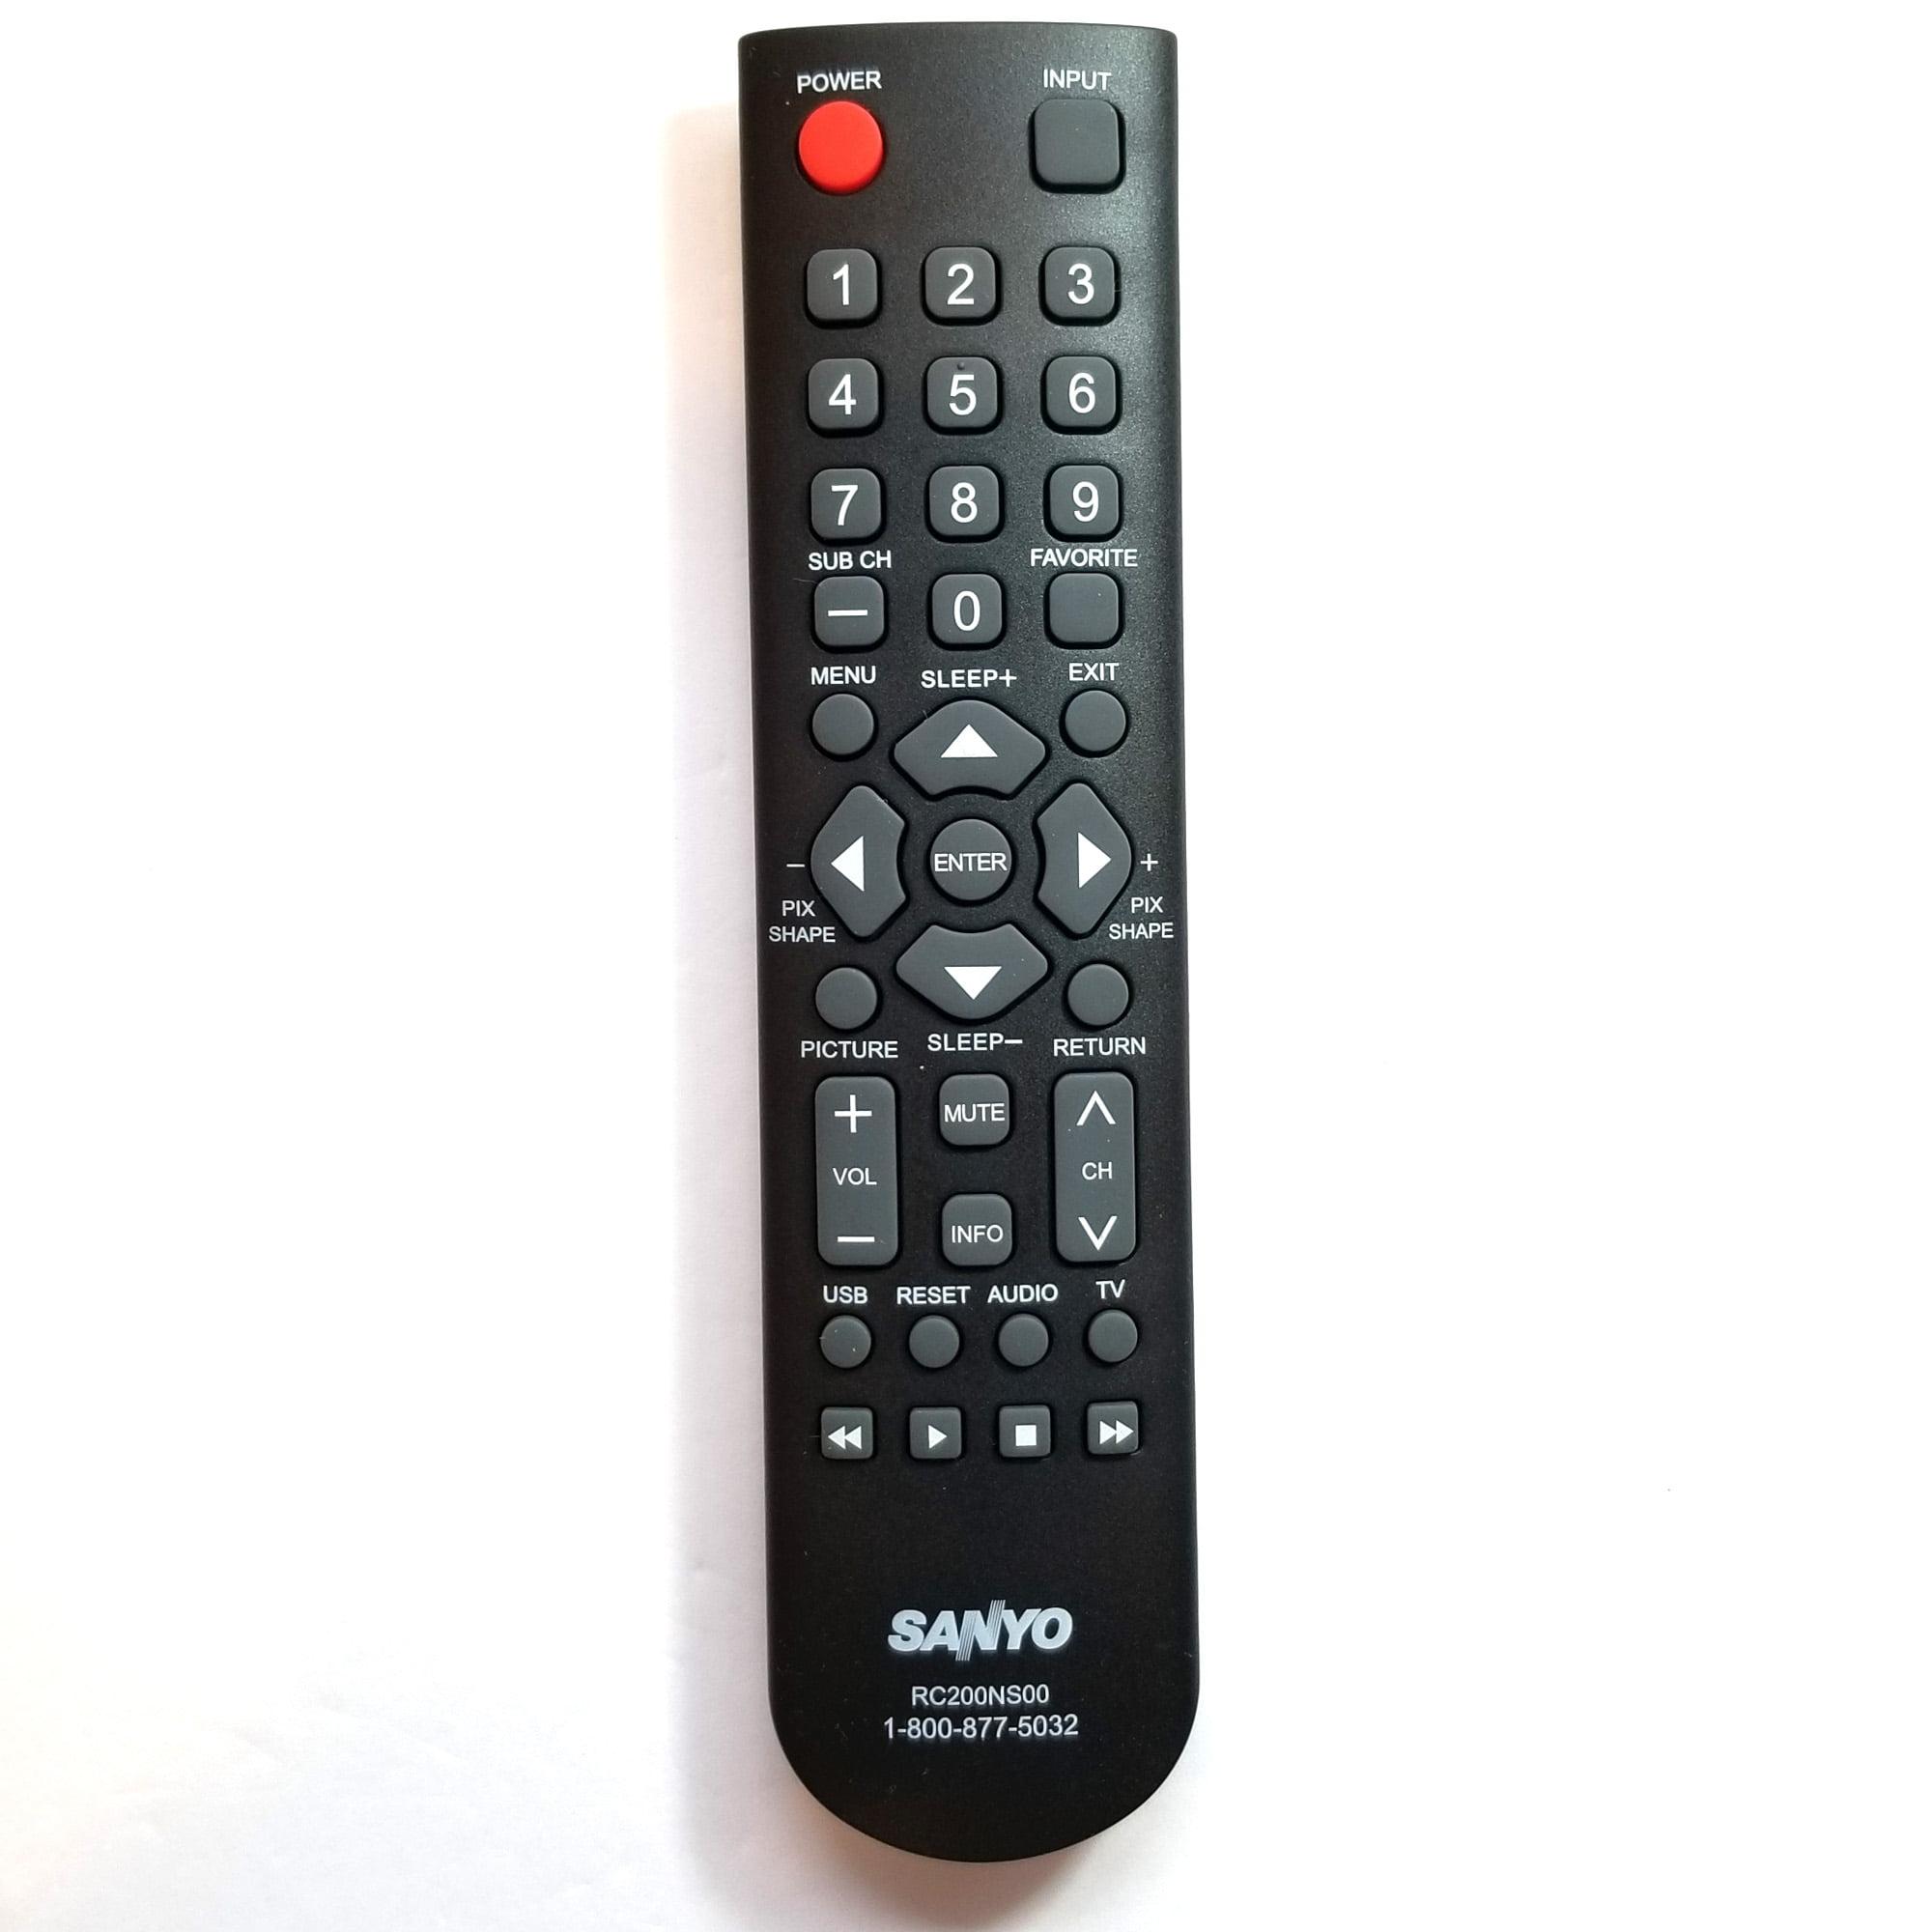 Factory Original Sanyo Rc200ns00 Lcd Led Hd Tv Remote Control For Sanyo Hdtv Television Walmart Com Walmart Com